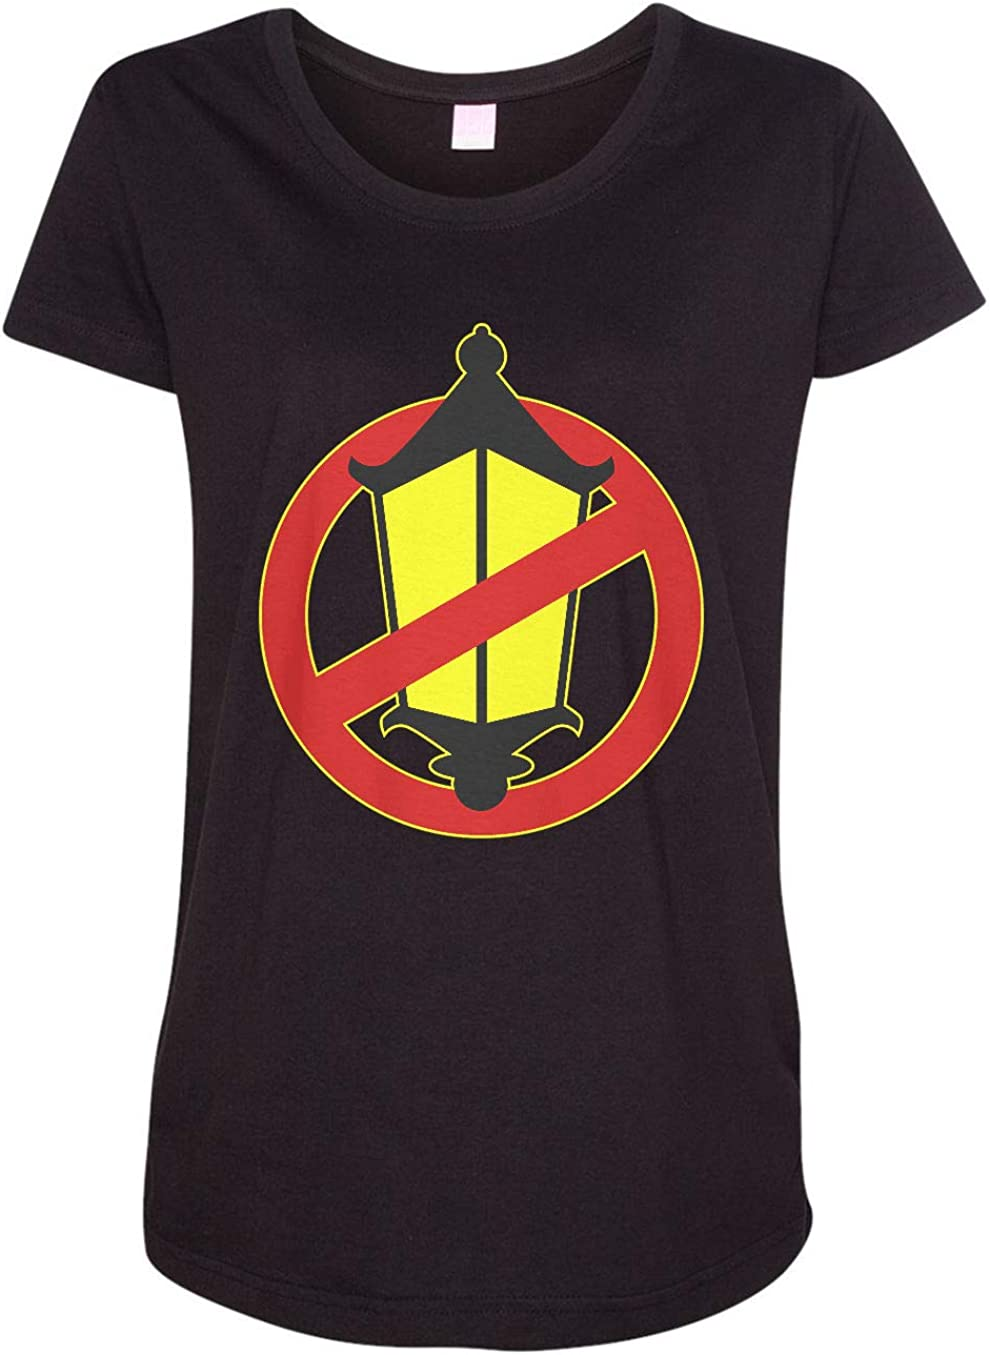 HARD EDGE DESIGN Women's No Gaslighting T-Shirt